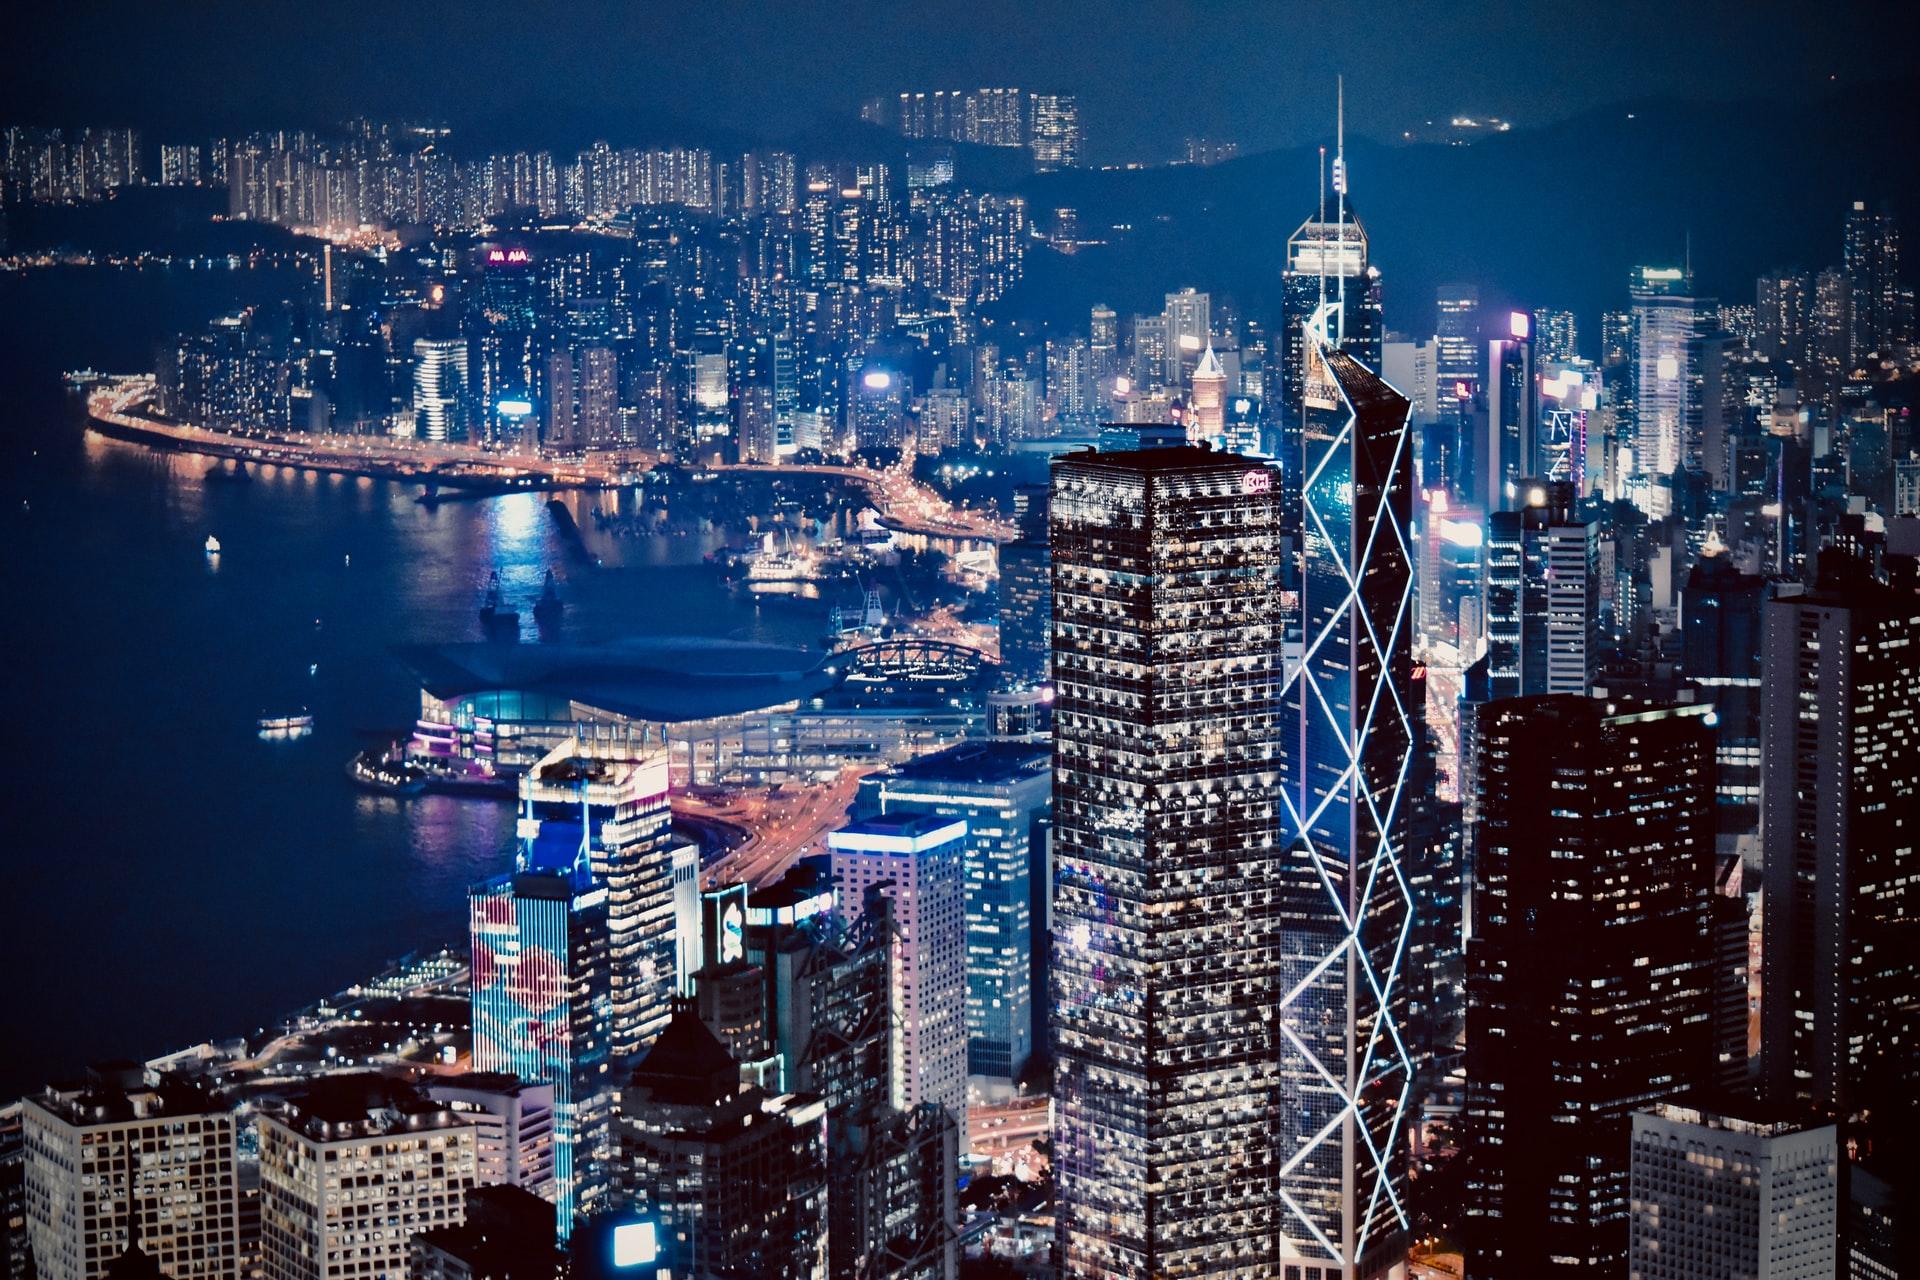 Finance News - Hong Kong Losing Financial Battle With Covid